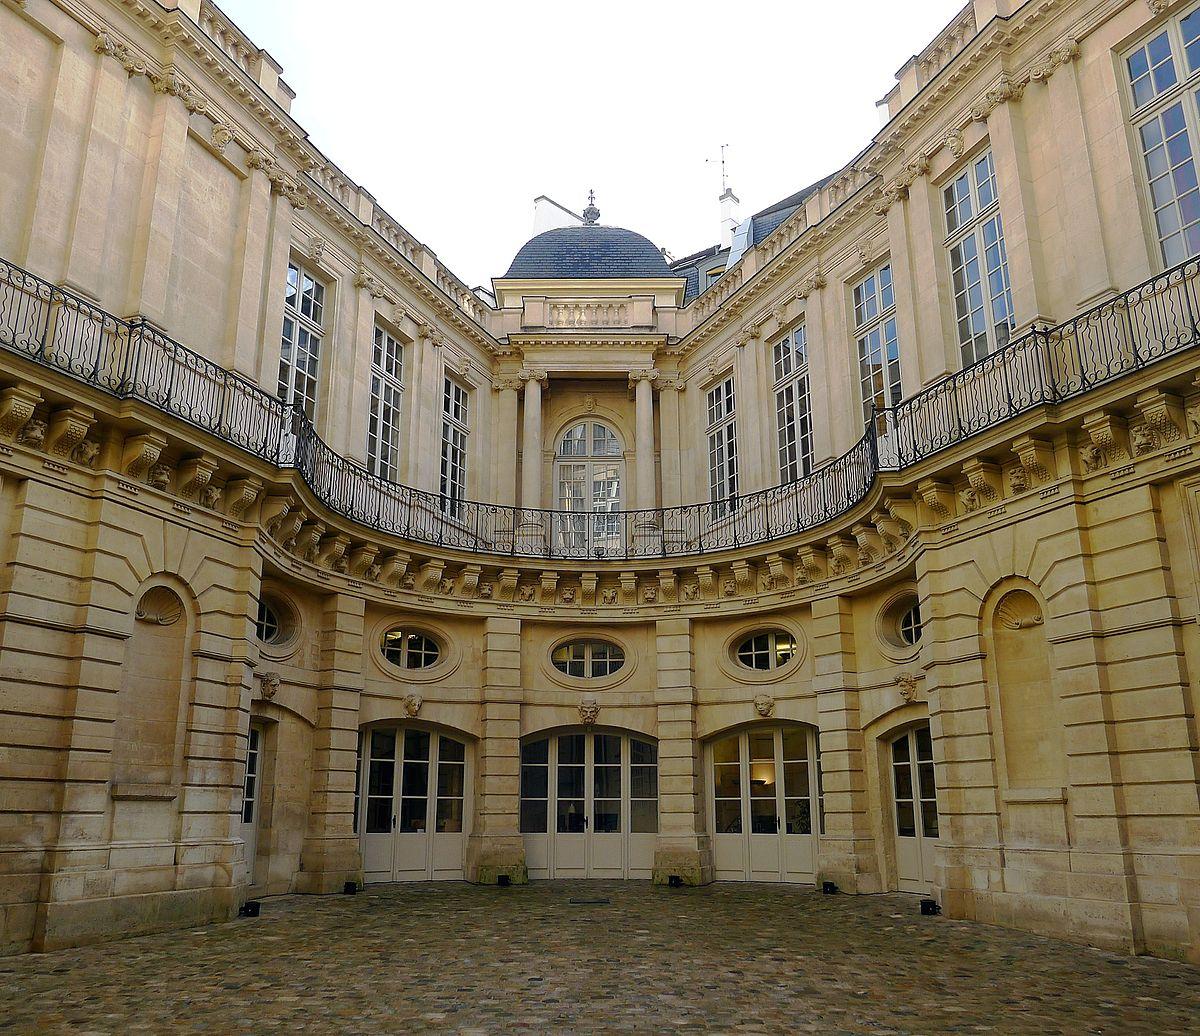 H tel de beauvais wikidata for Hotel de paris